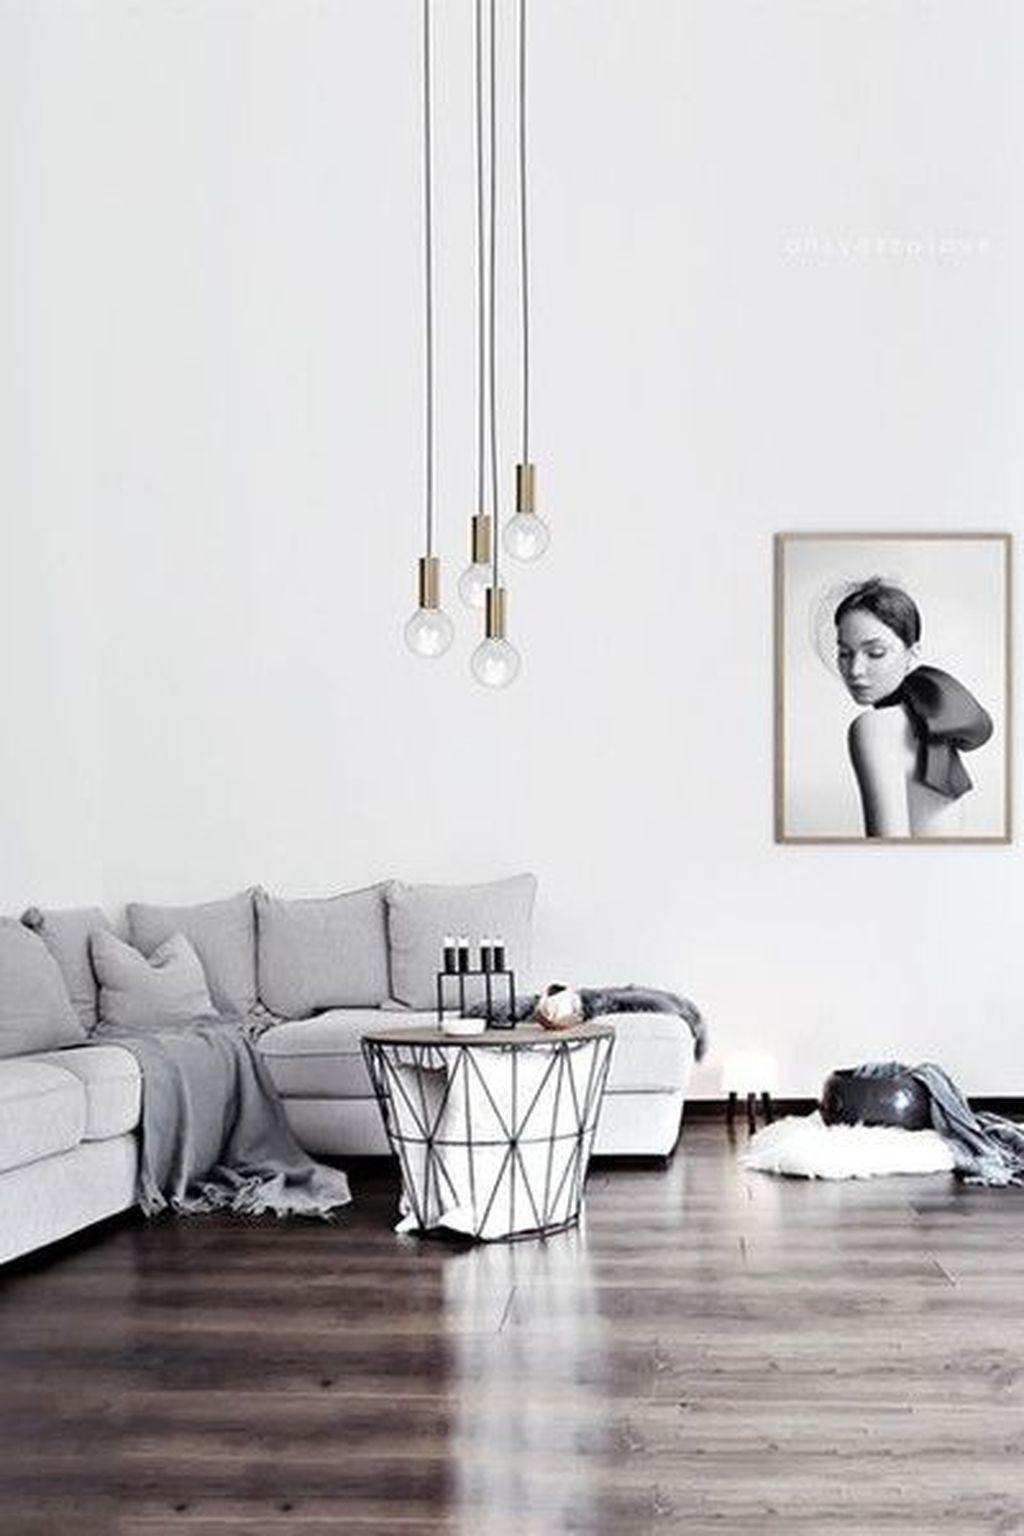 40+Awesome Emphasis Interior Design Ideas | Modern ...